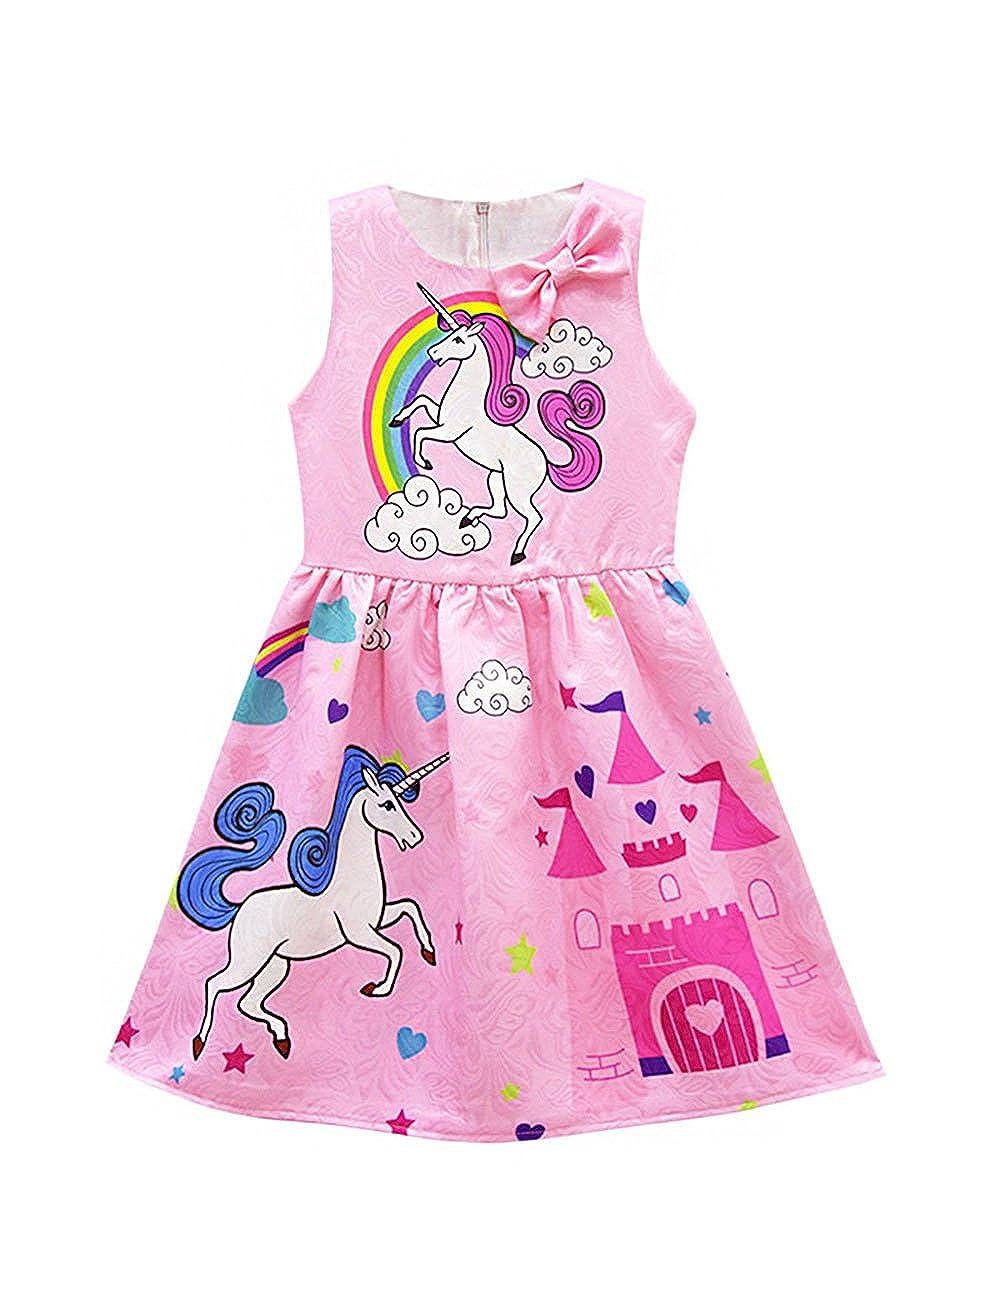 KYMIDY Summer Autumn Girls Sleeveless Unicorn Dress Toddler Long Sleeve Rainbow Bow Casual Dress 2-10T